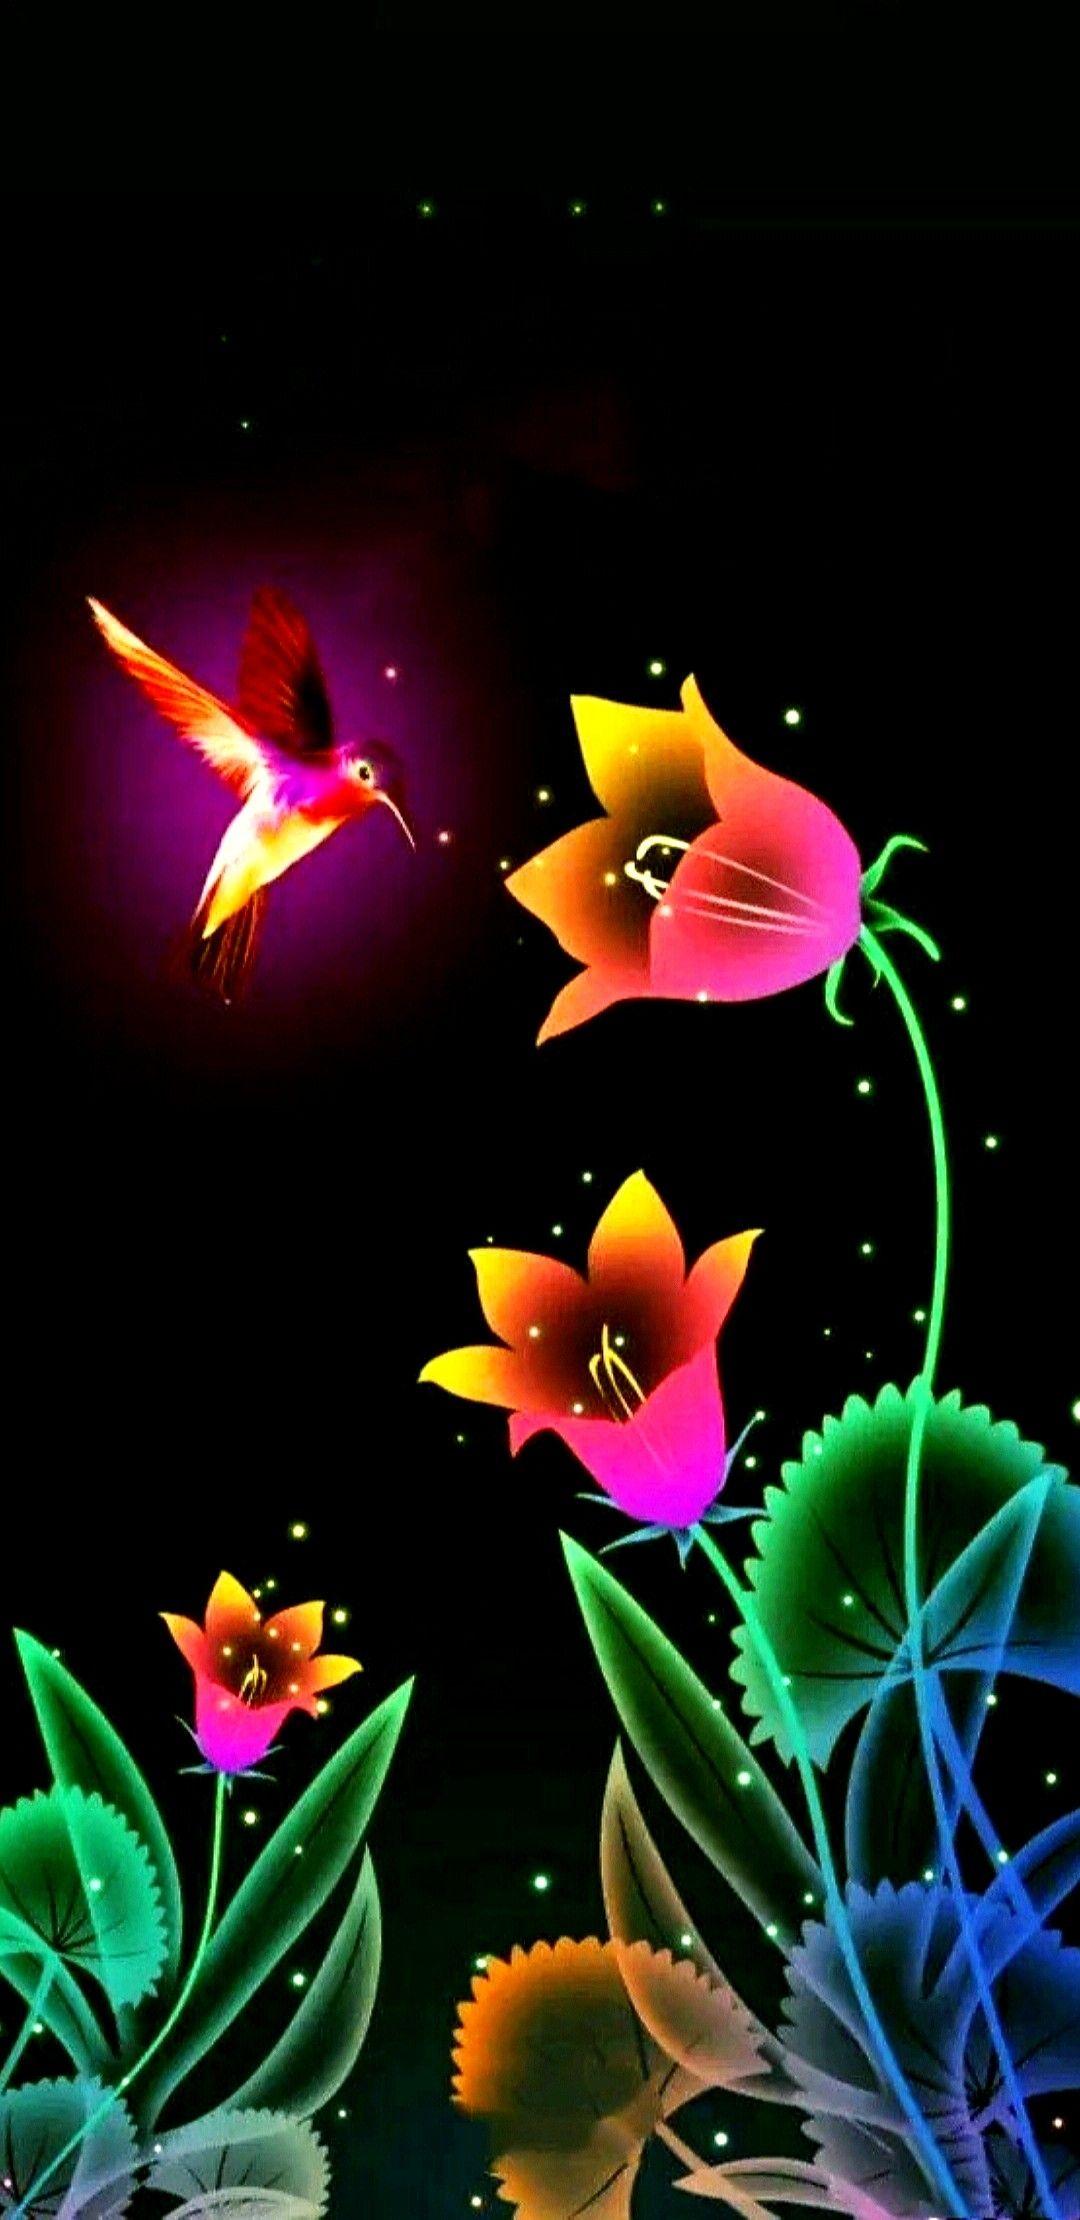 Colorful Hummingbird Flowers Wallpaper Hummingbird Wallpaper Abstract Iphone Wallpaper Neon Flowers Coolest neon flower wallpaper